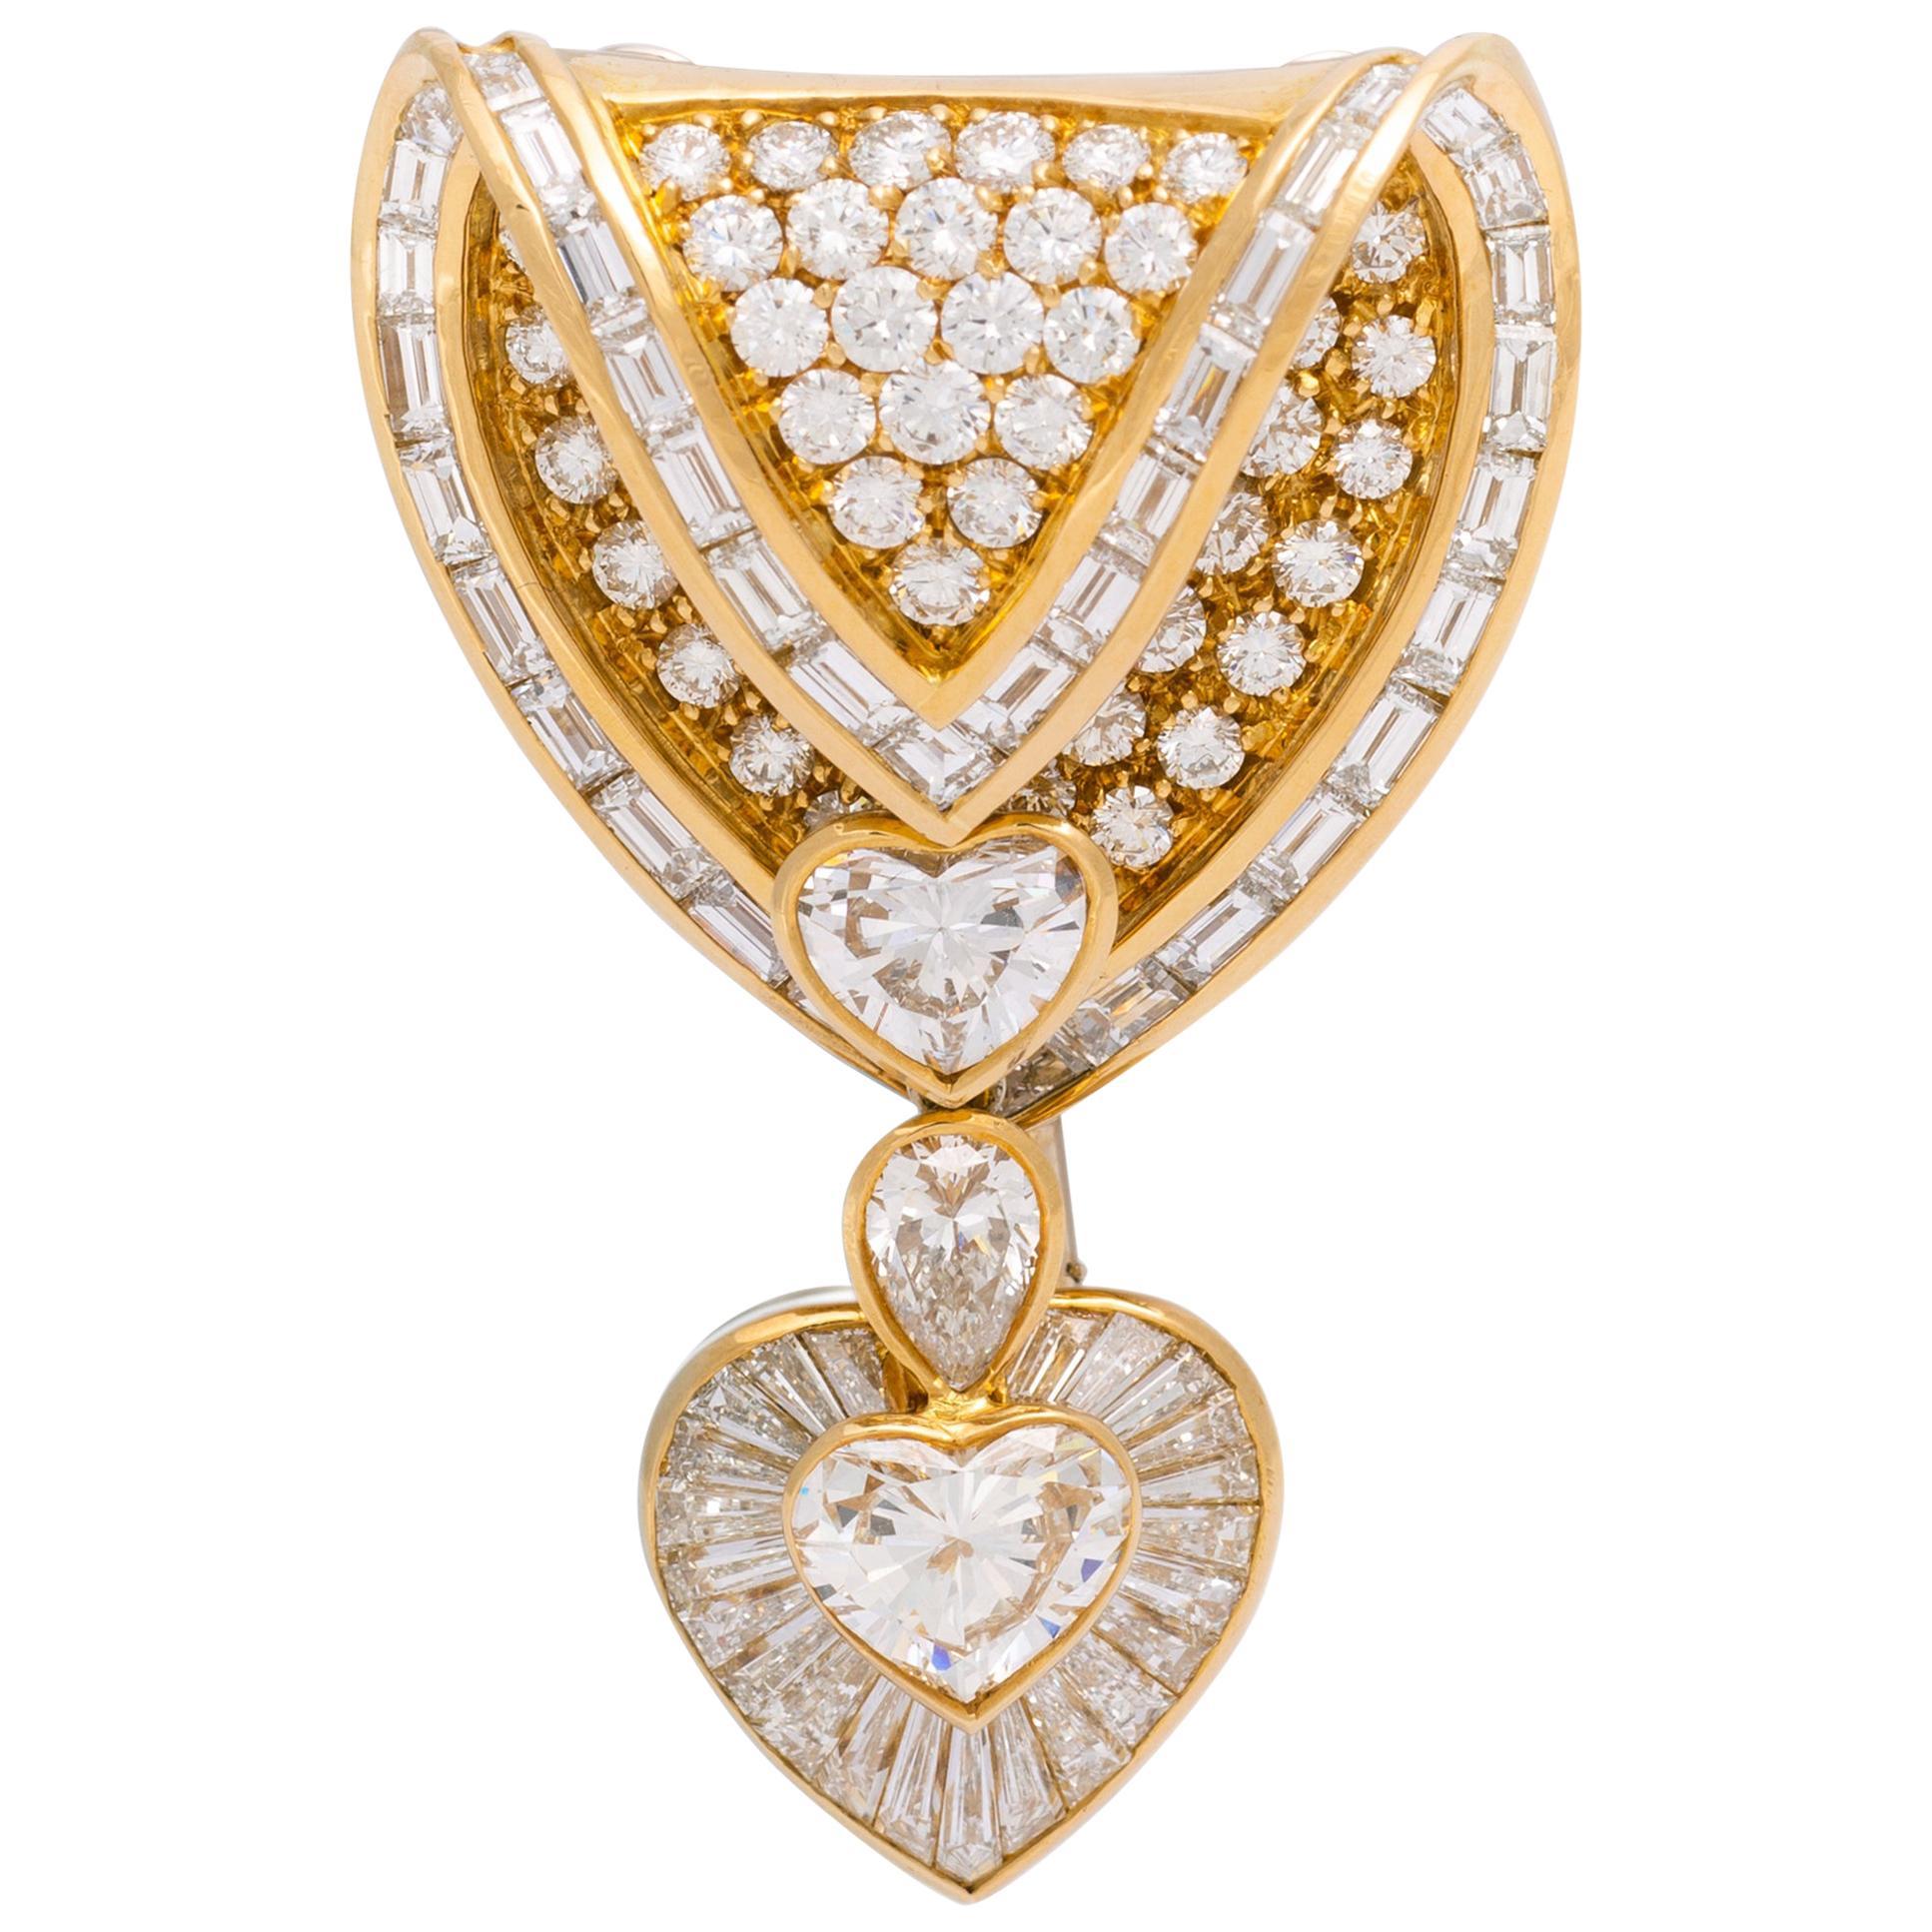 Brooch Pendant Heart Shape Diamond Yellow Gold